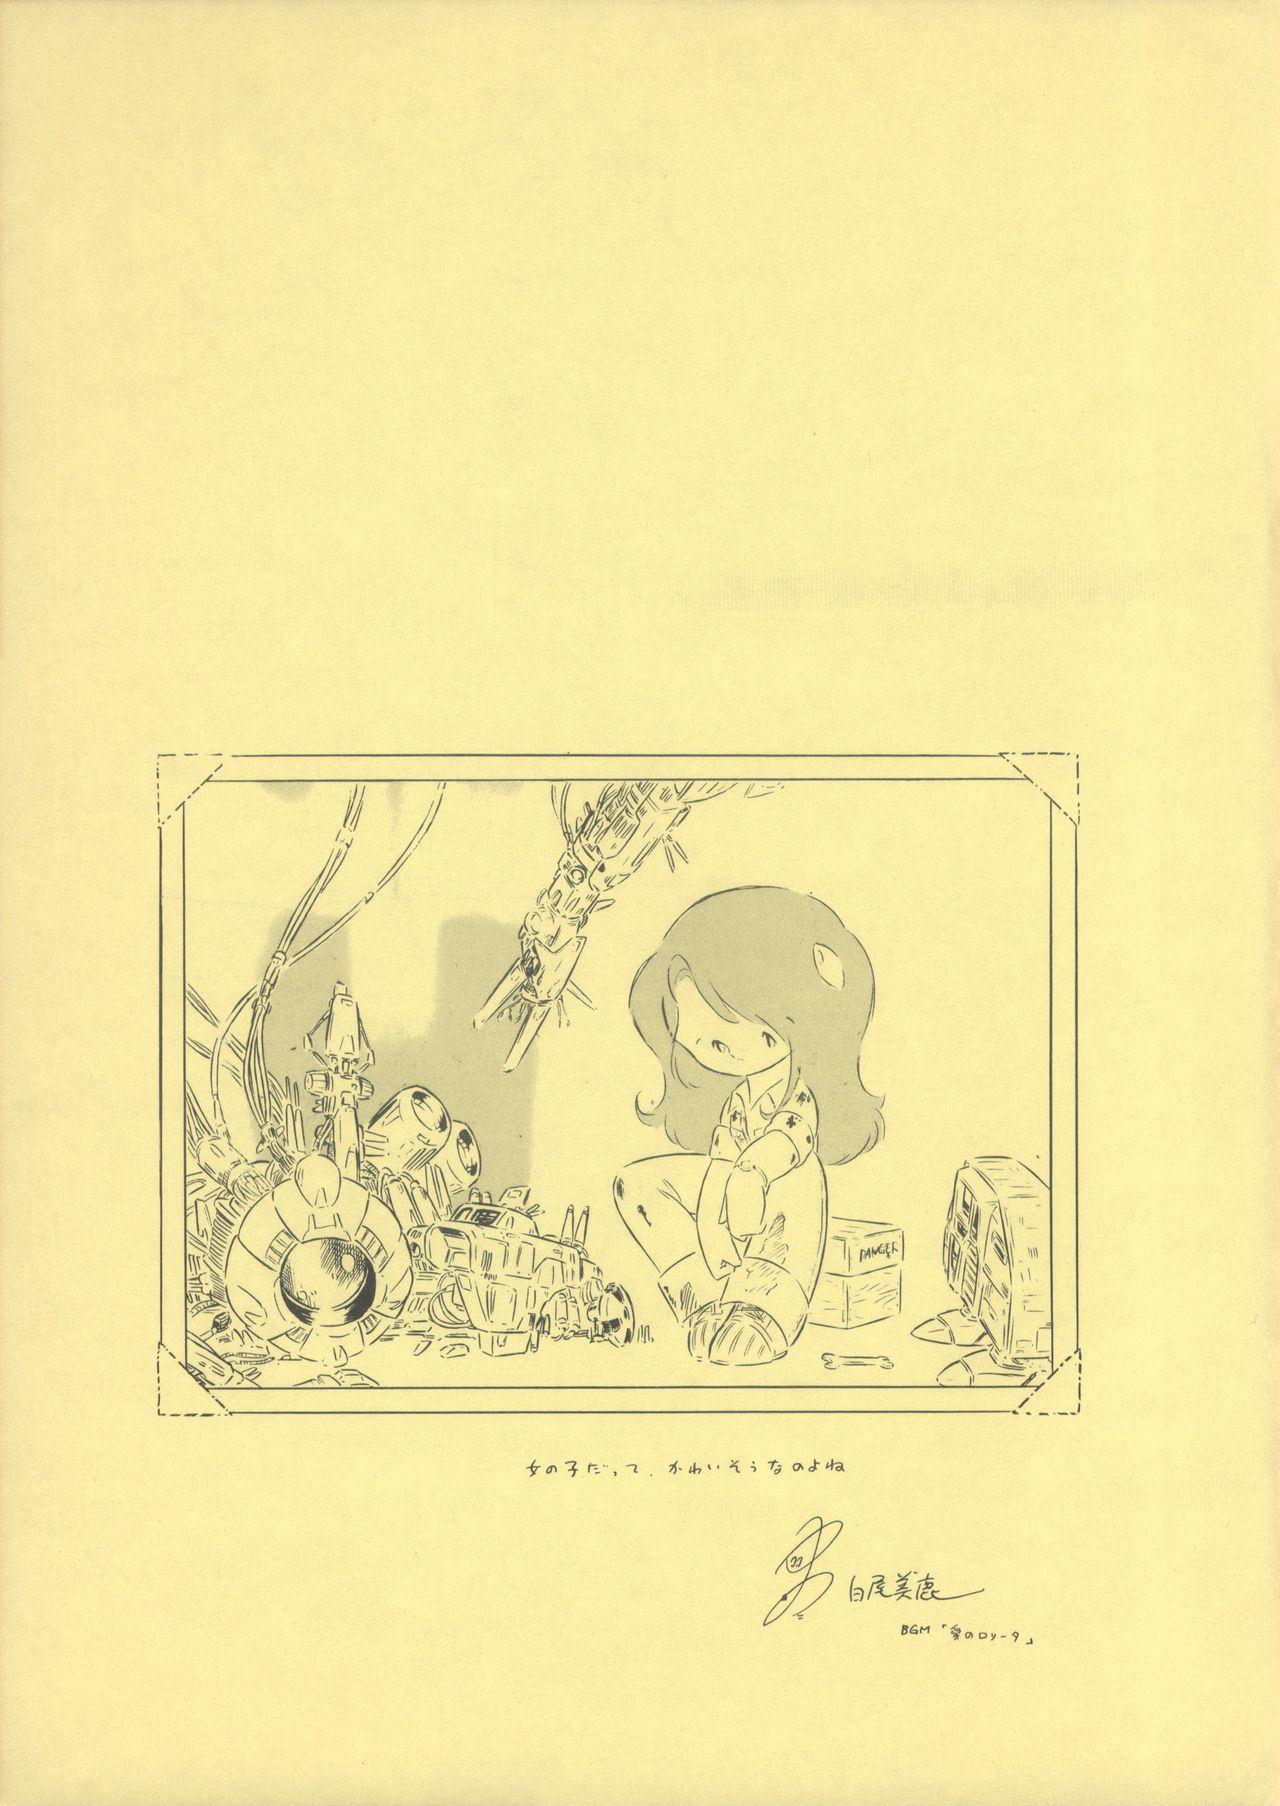 TEKUNO RORIA 96